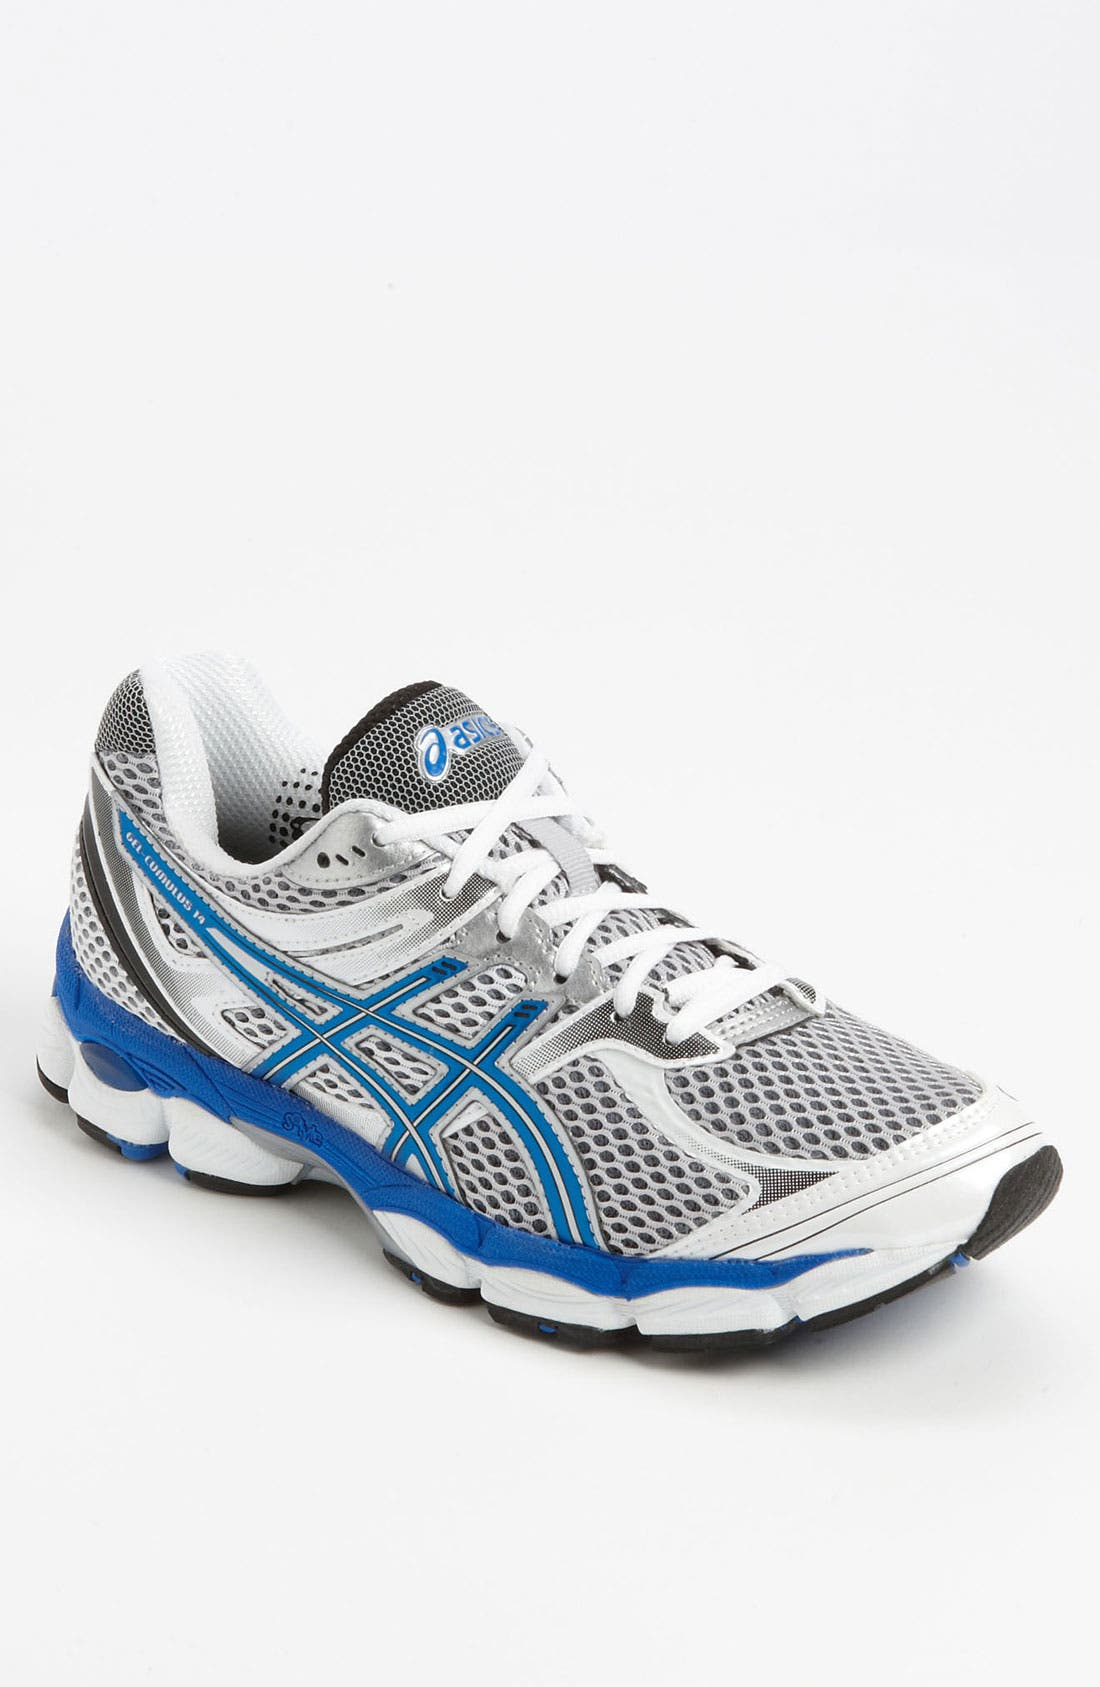 Alternate Image 1 Selected - ASICS® 'GEL-Cumulus 14' Running Shoe (Men)